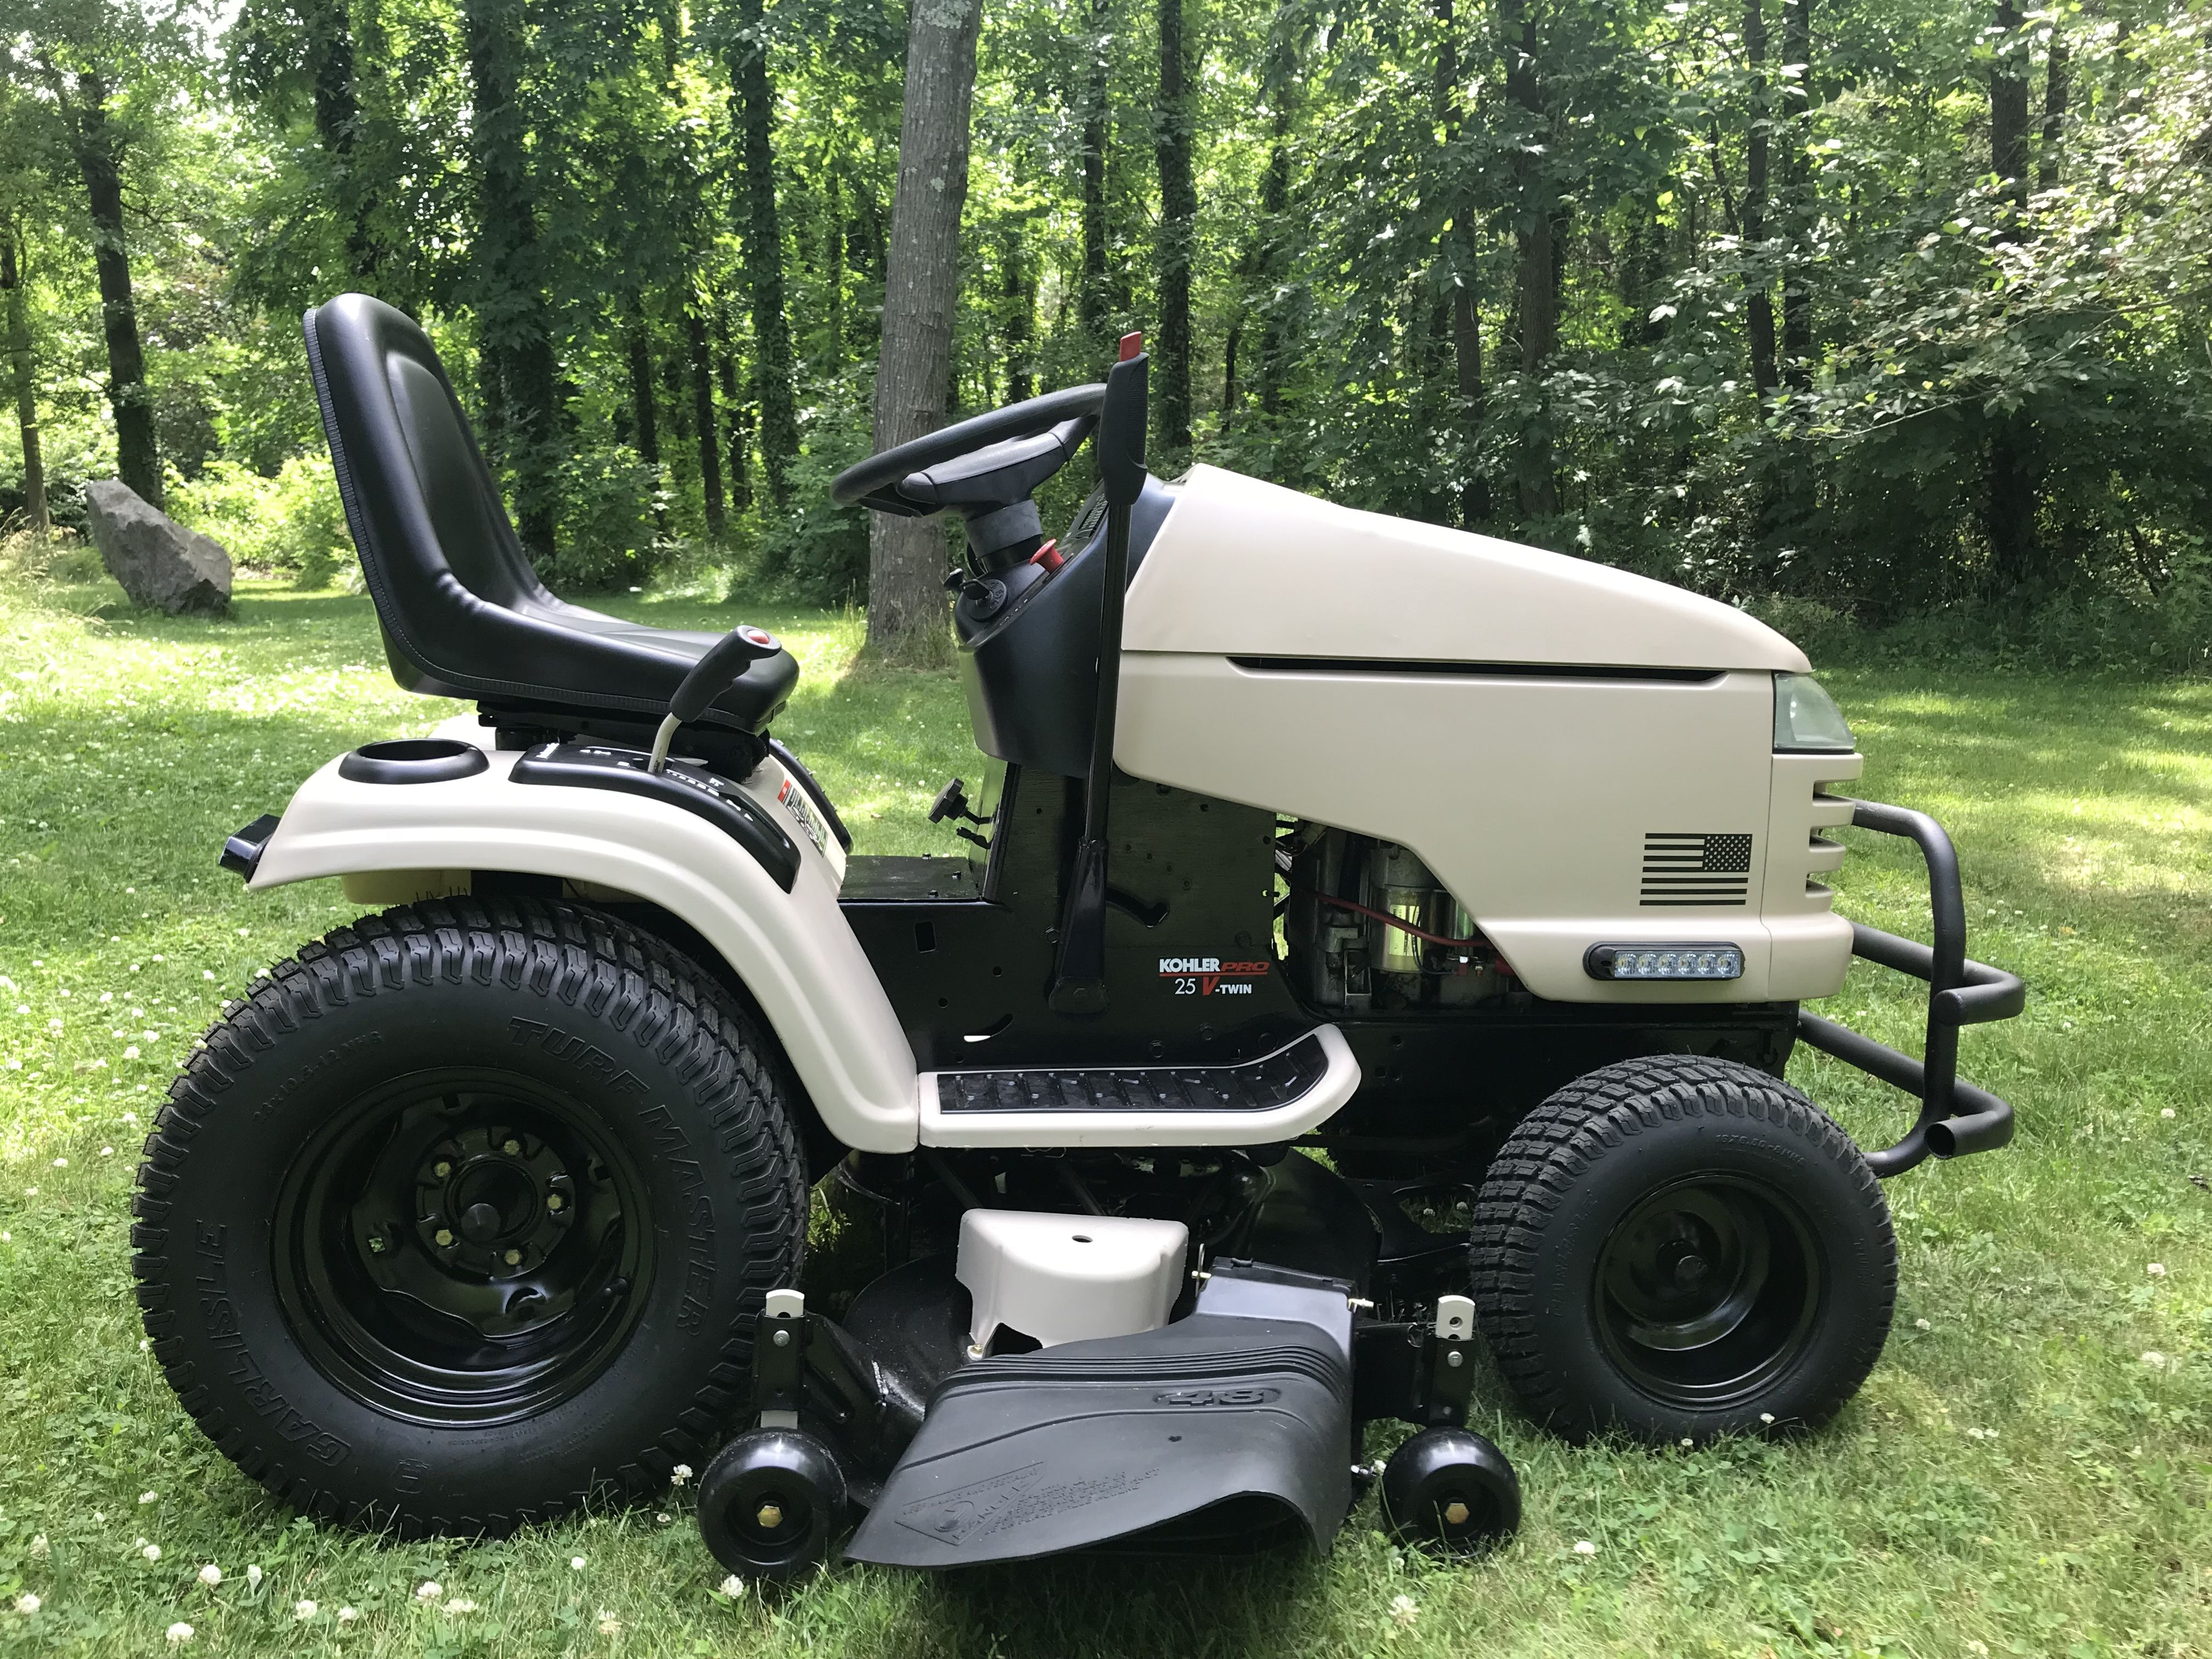 Usmc Craftsman Gt5000 Tractor I Restored April 2019 Riding Mower Riding Lawnmower Tractors